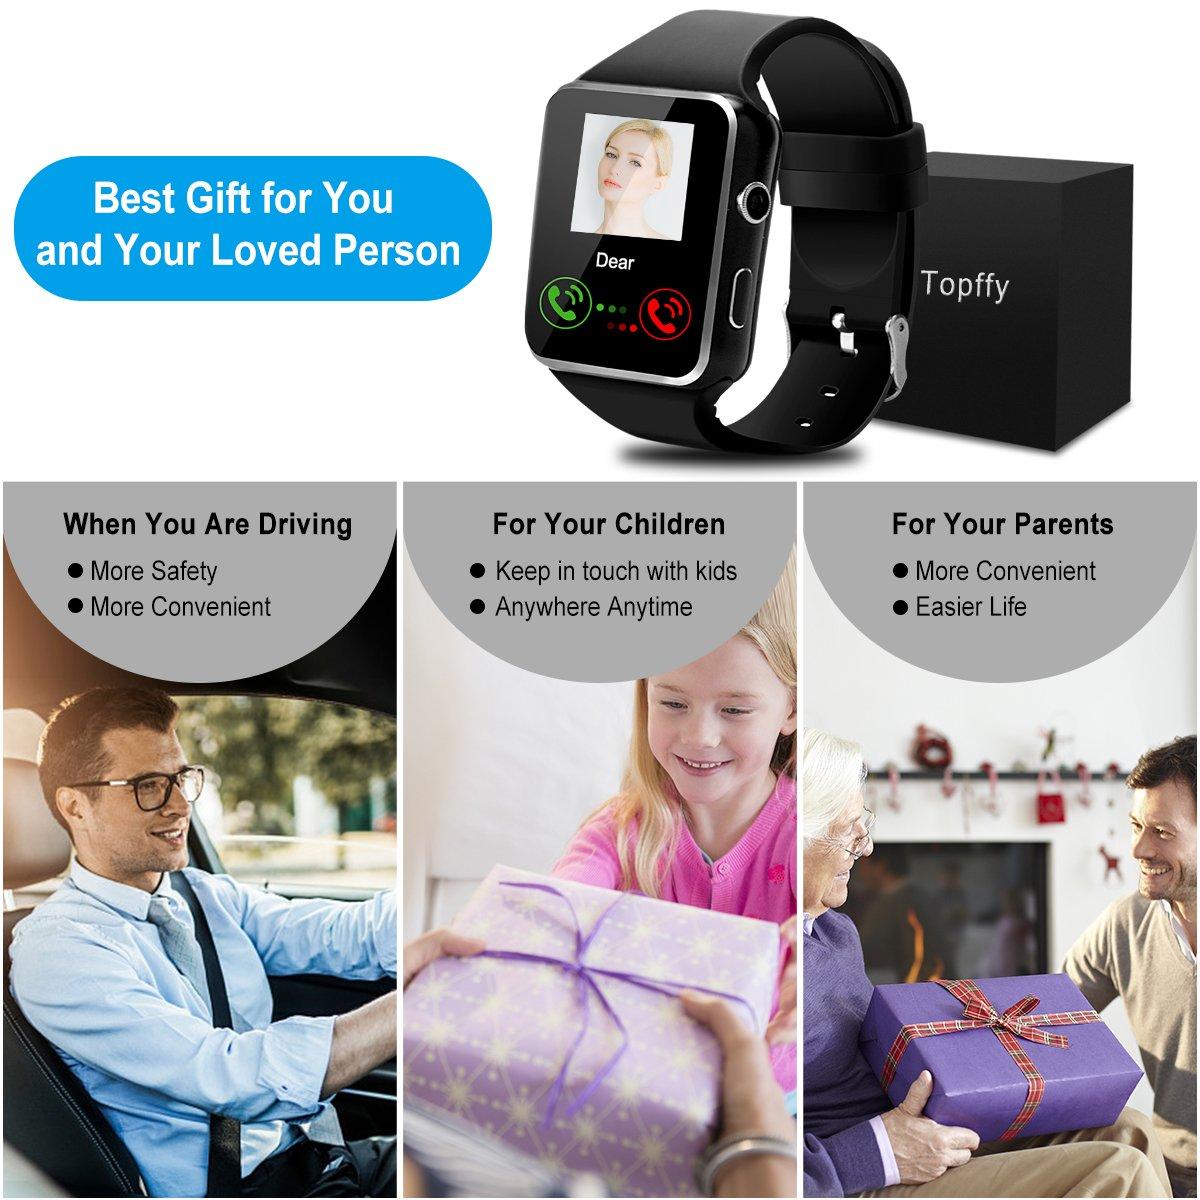 Smart Watch Bluetooth Touchscreen Smart Wrist Watch Smartwatch Phone Fitness Tracker with Sim SD Card Slot Camera Pedometer Compatible by IPXOZO (Image #2)